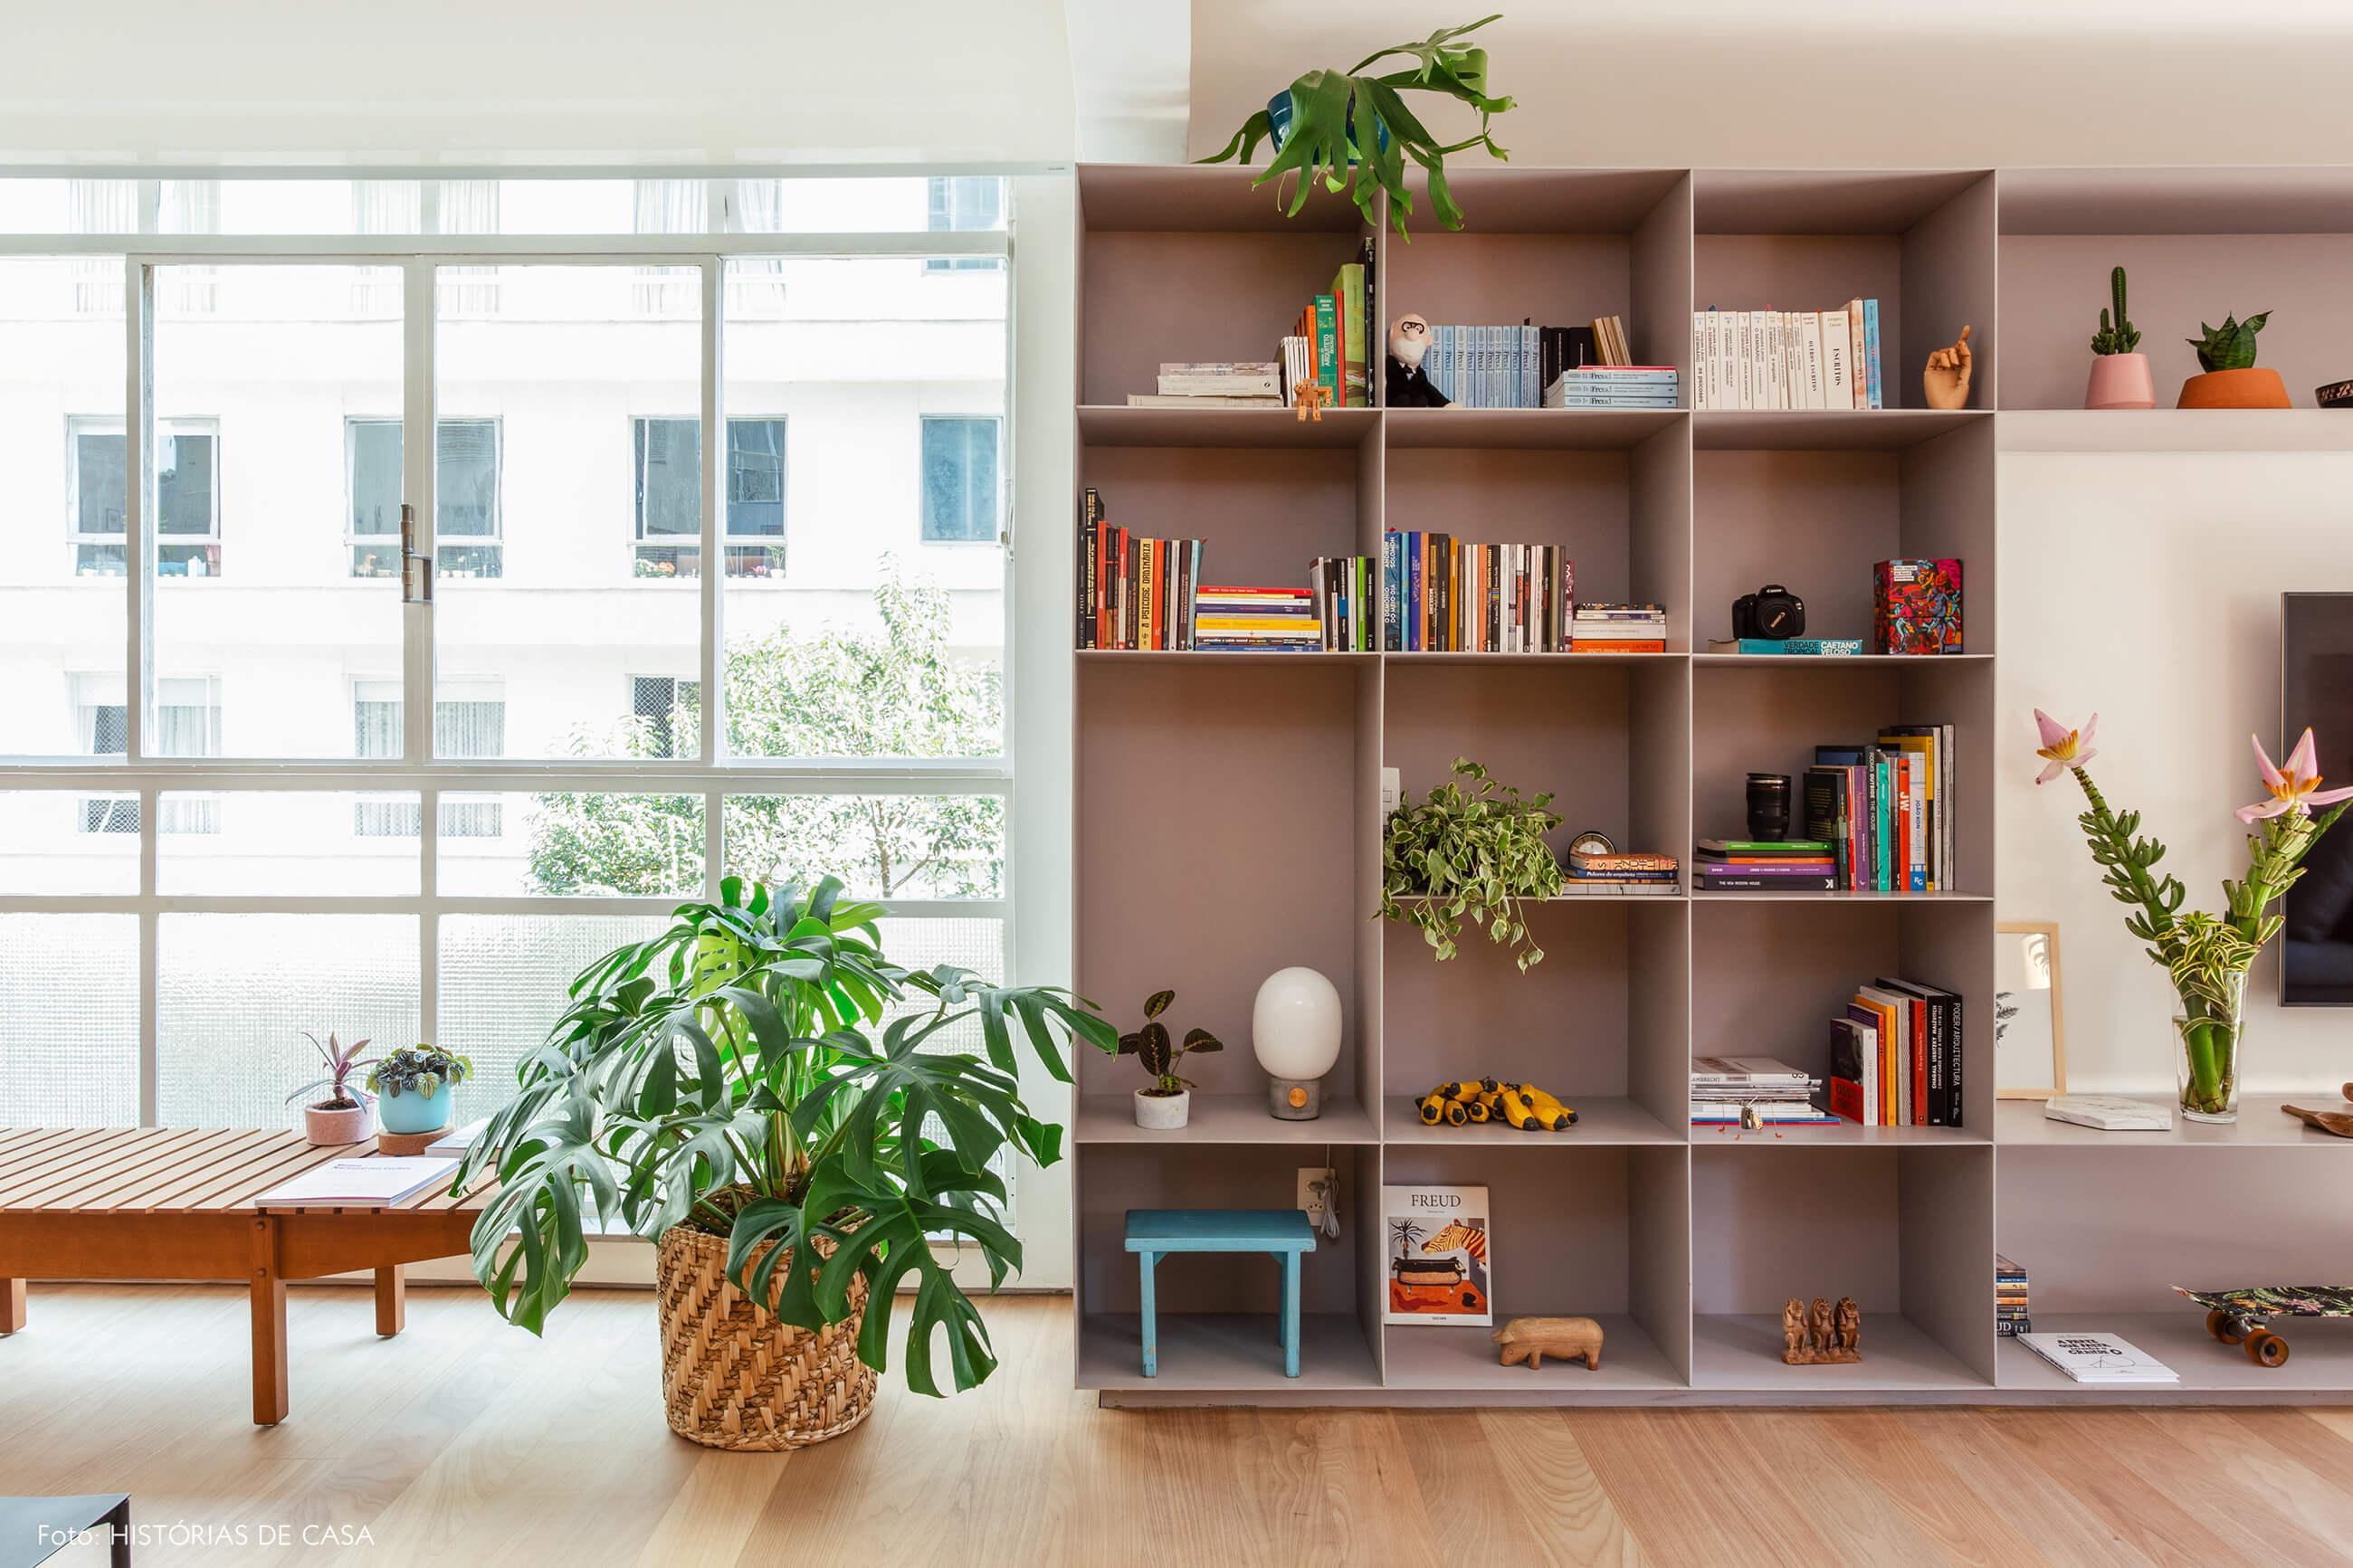 08-decoracao-apartamento-estante-metalica-cinza-serralheria-2